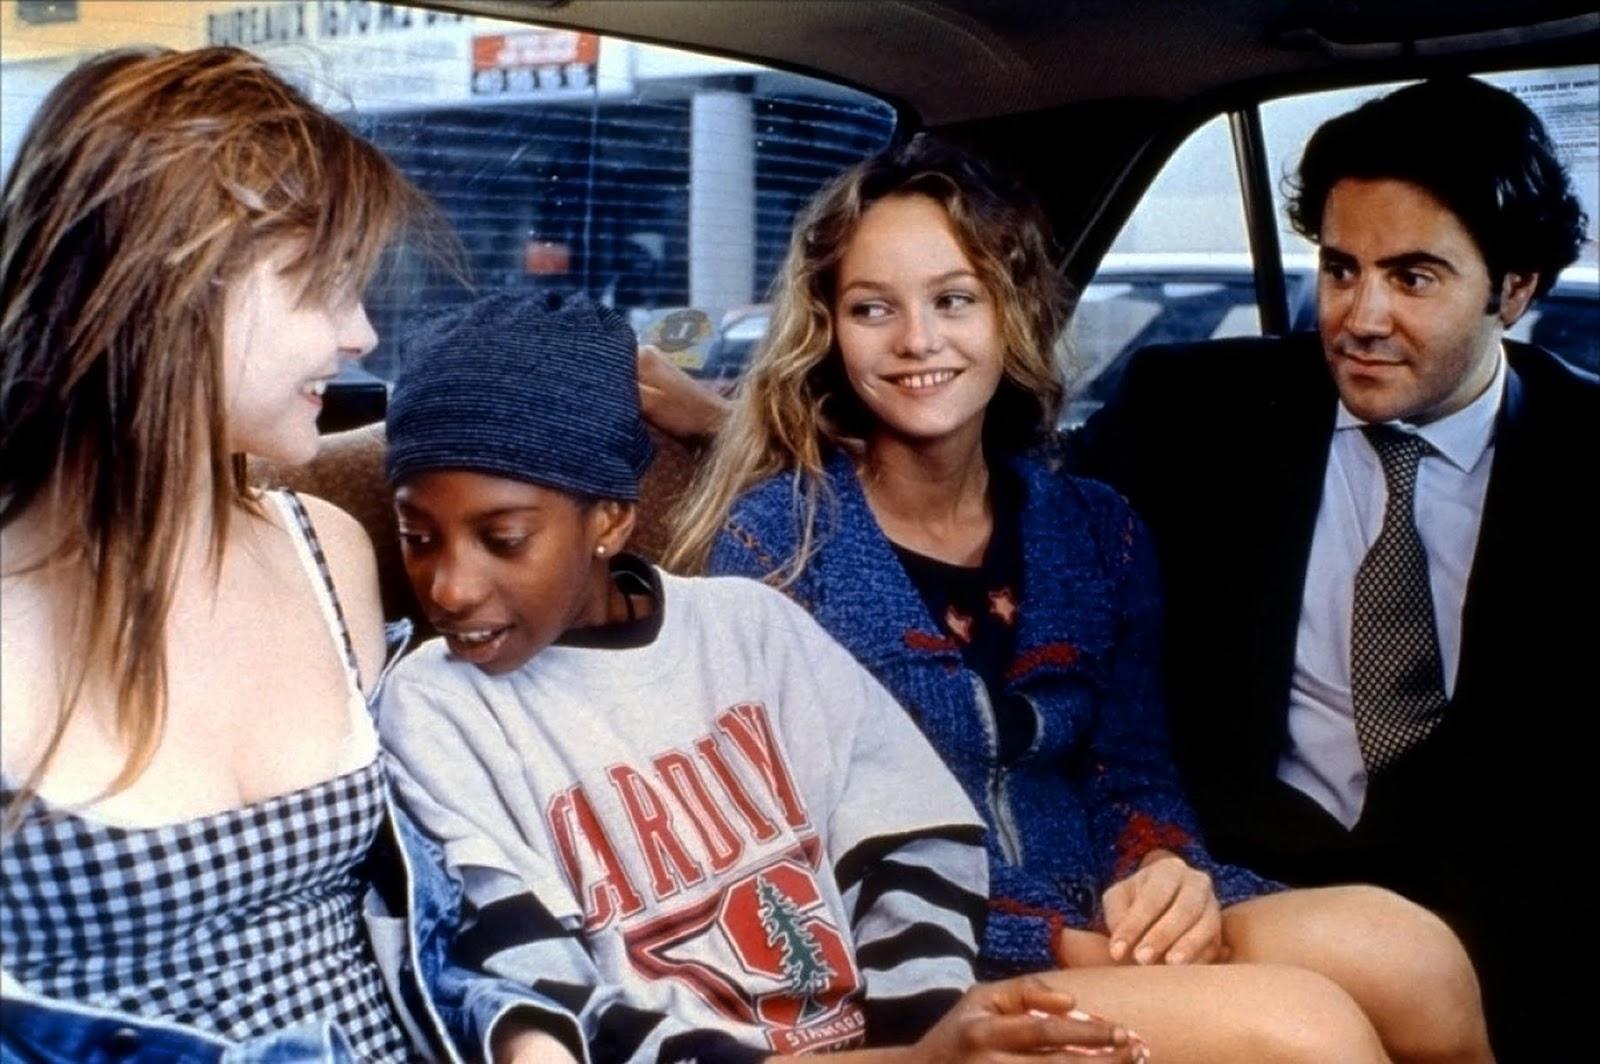 Clotilde Courau, José Garcia, Vanessa Paradis, and Sekkou Sall in Élisa (1995)